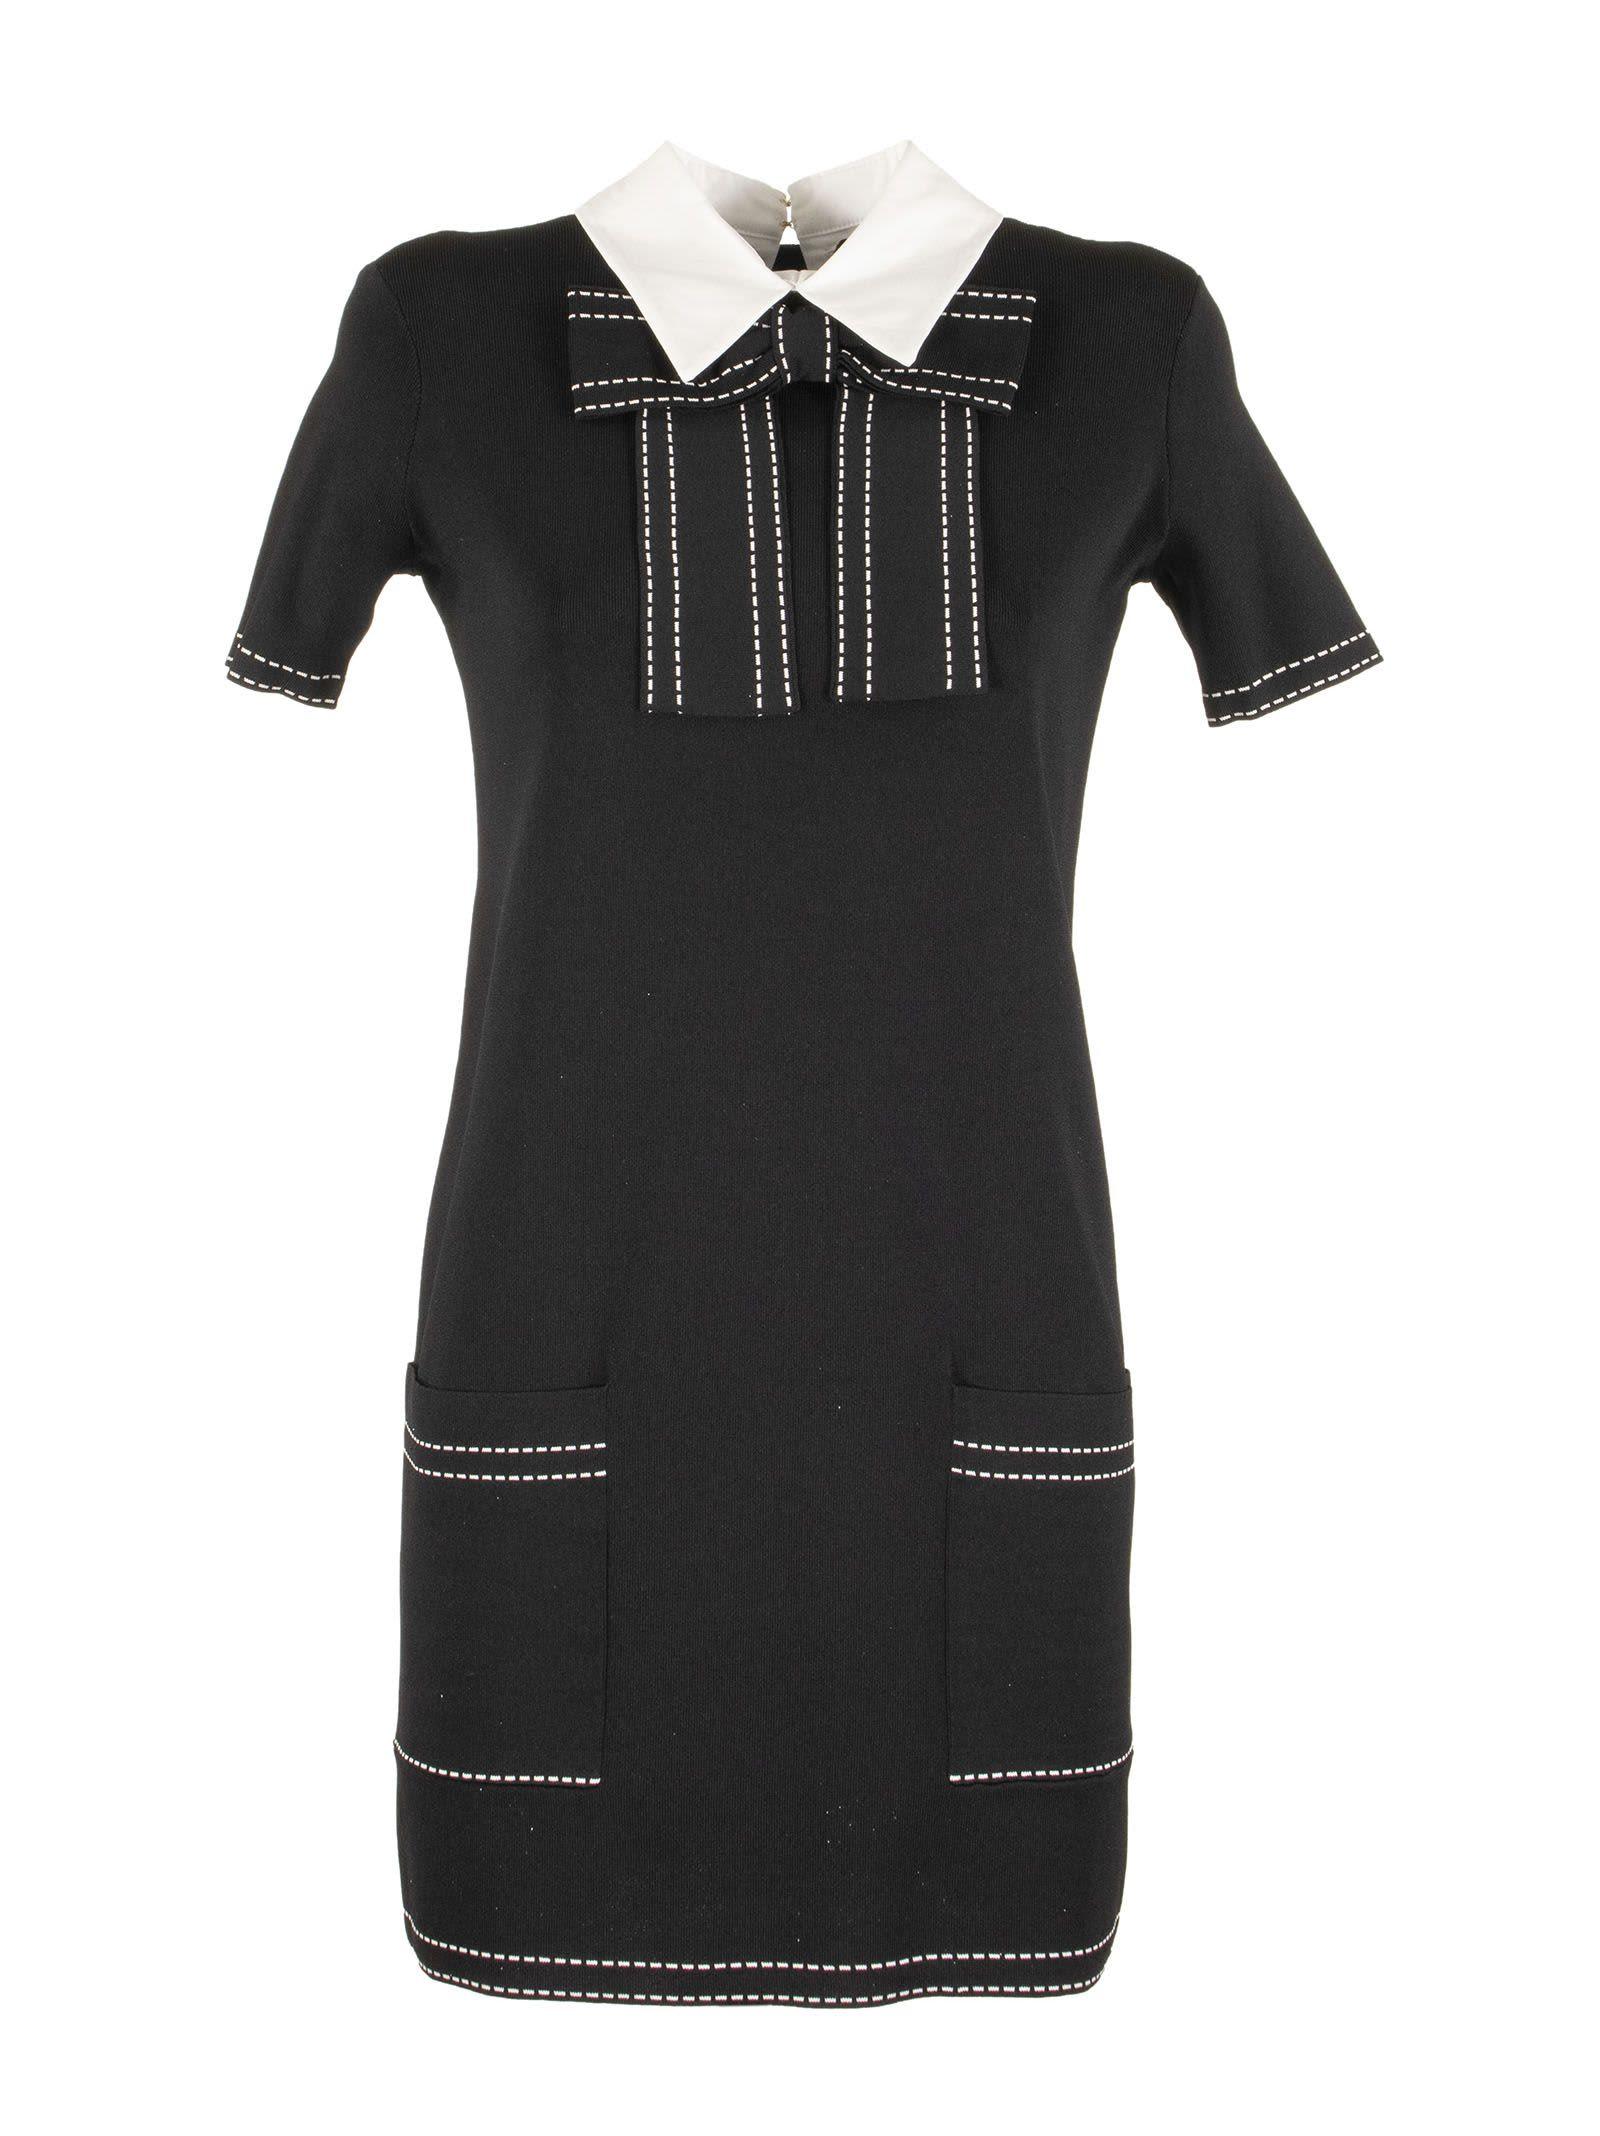 Buy Elisabetta Franchi Celyn B. Knit Dress With Bow online, shop Elisabetta Franchi Celyn B. with free shipping